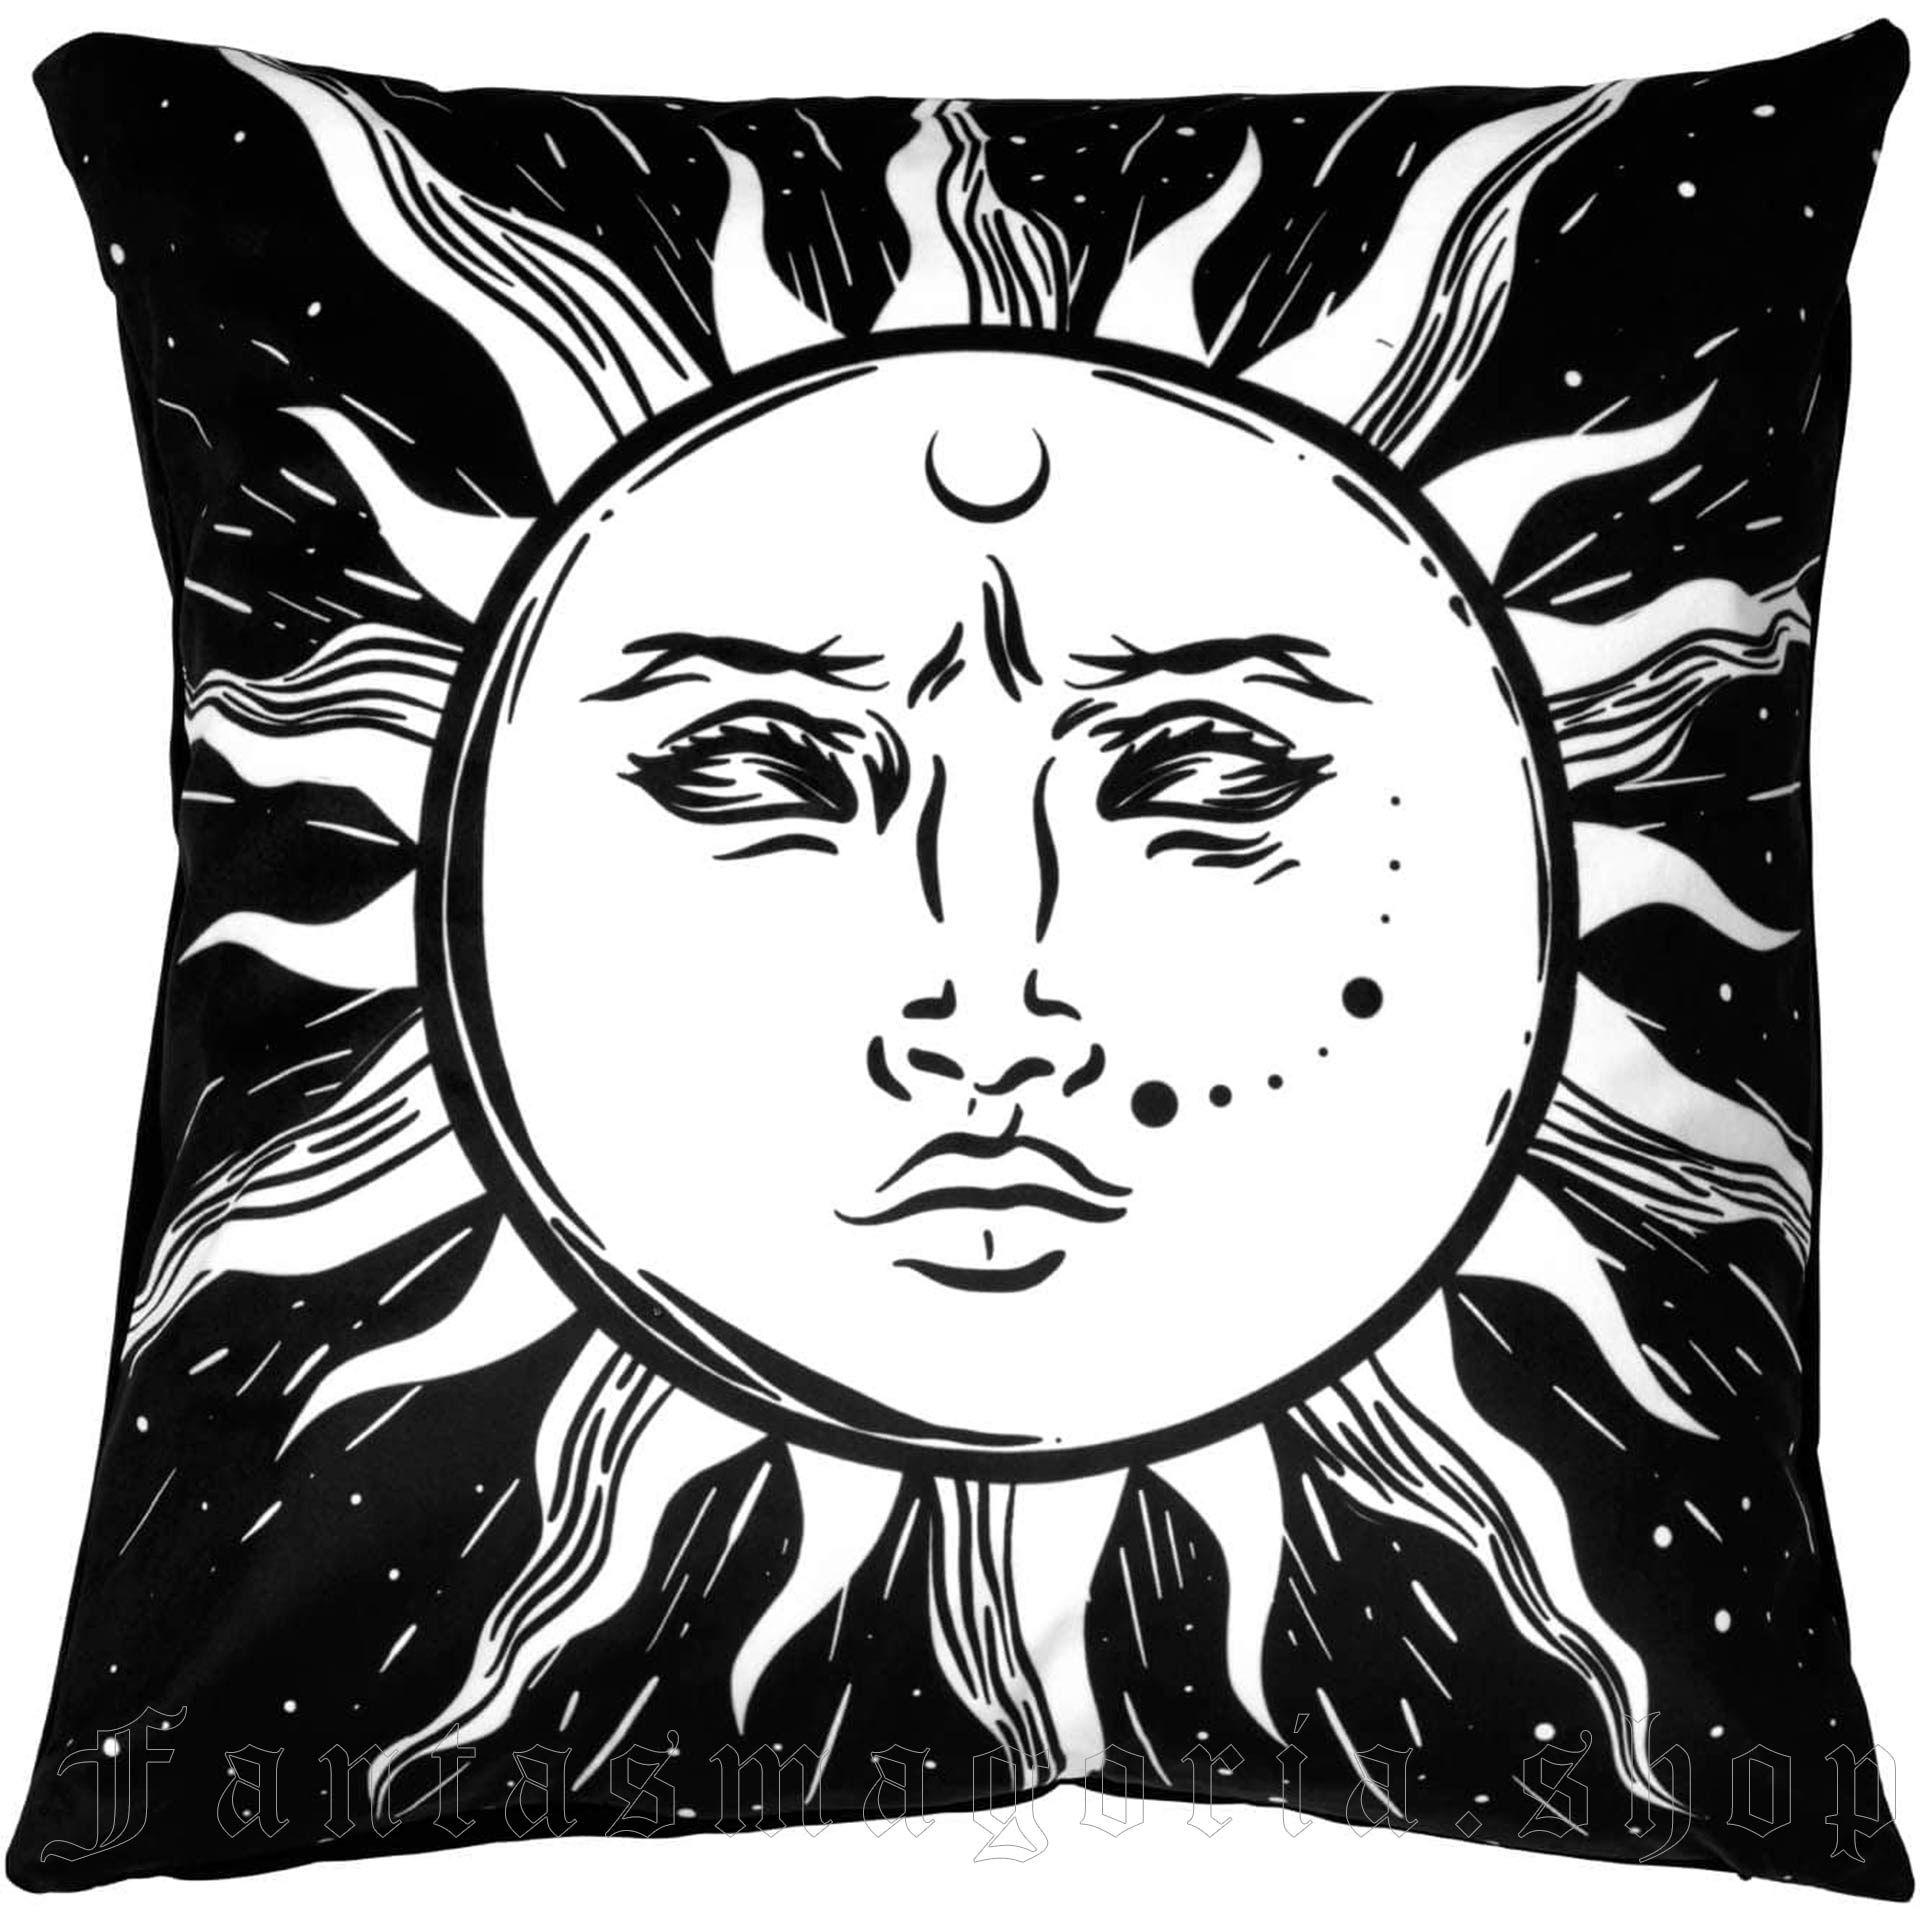 Vintage Sun Cushion Cover